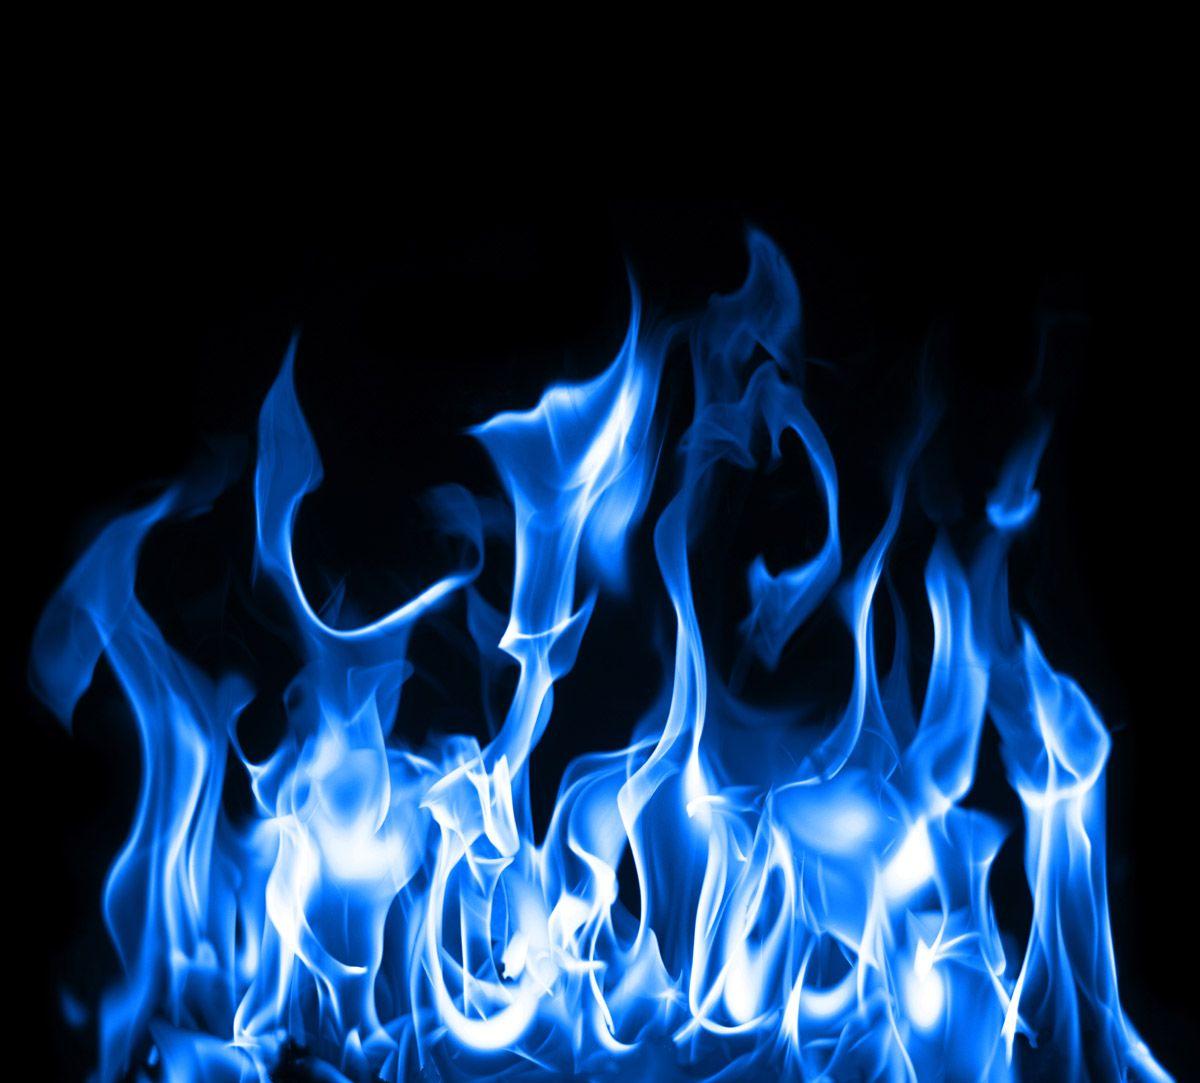 Blue Flame Wallpaper Hd